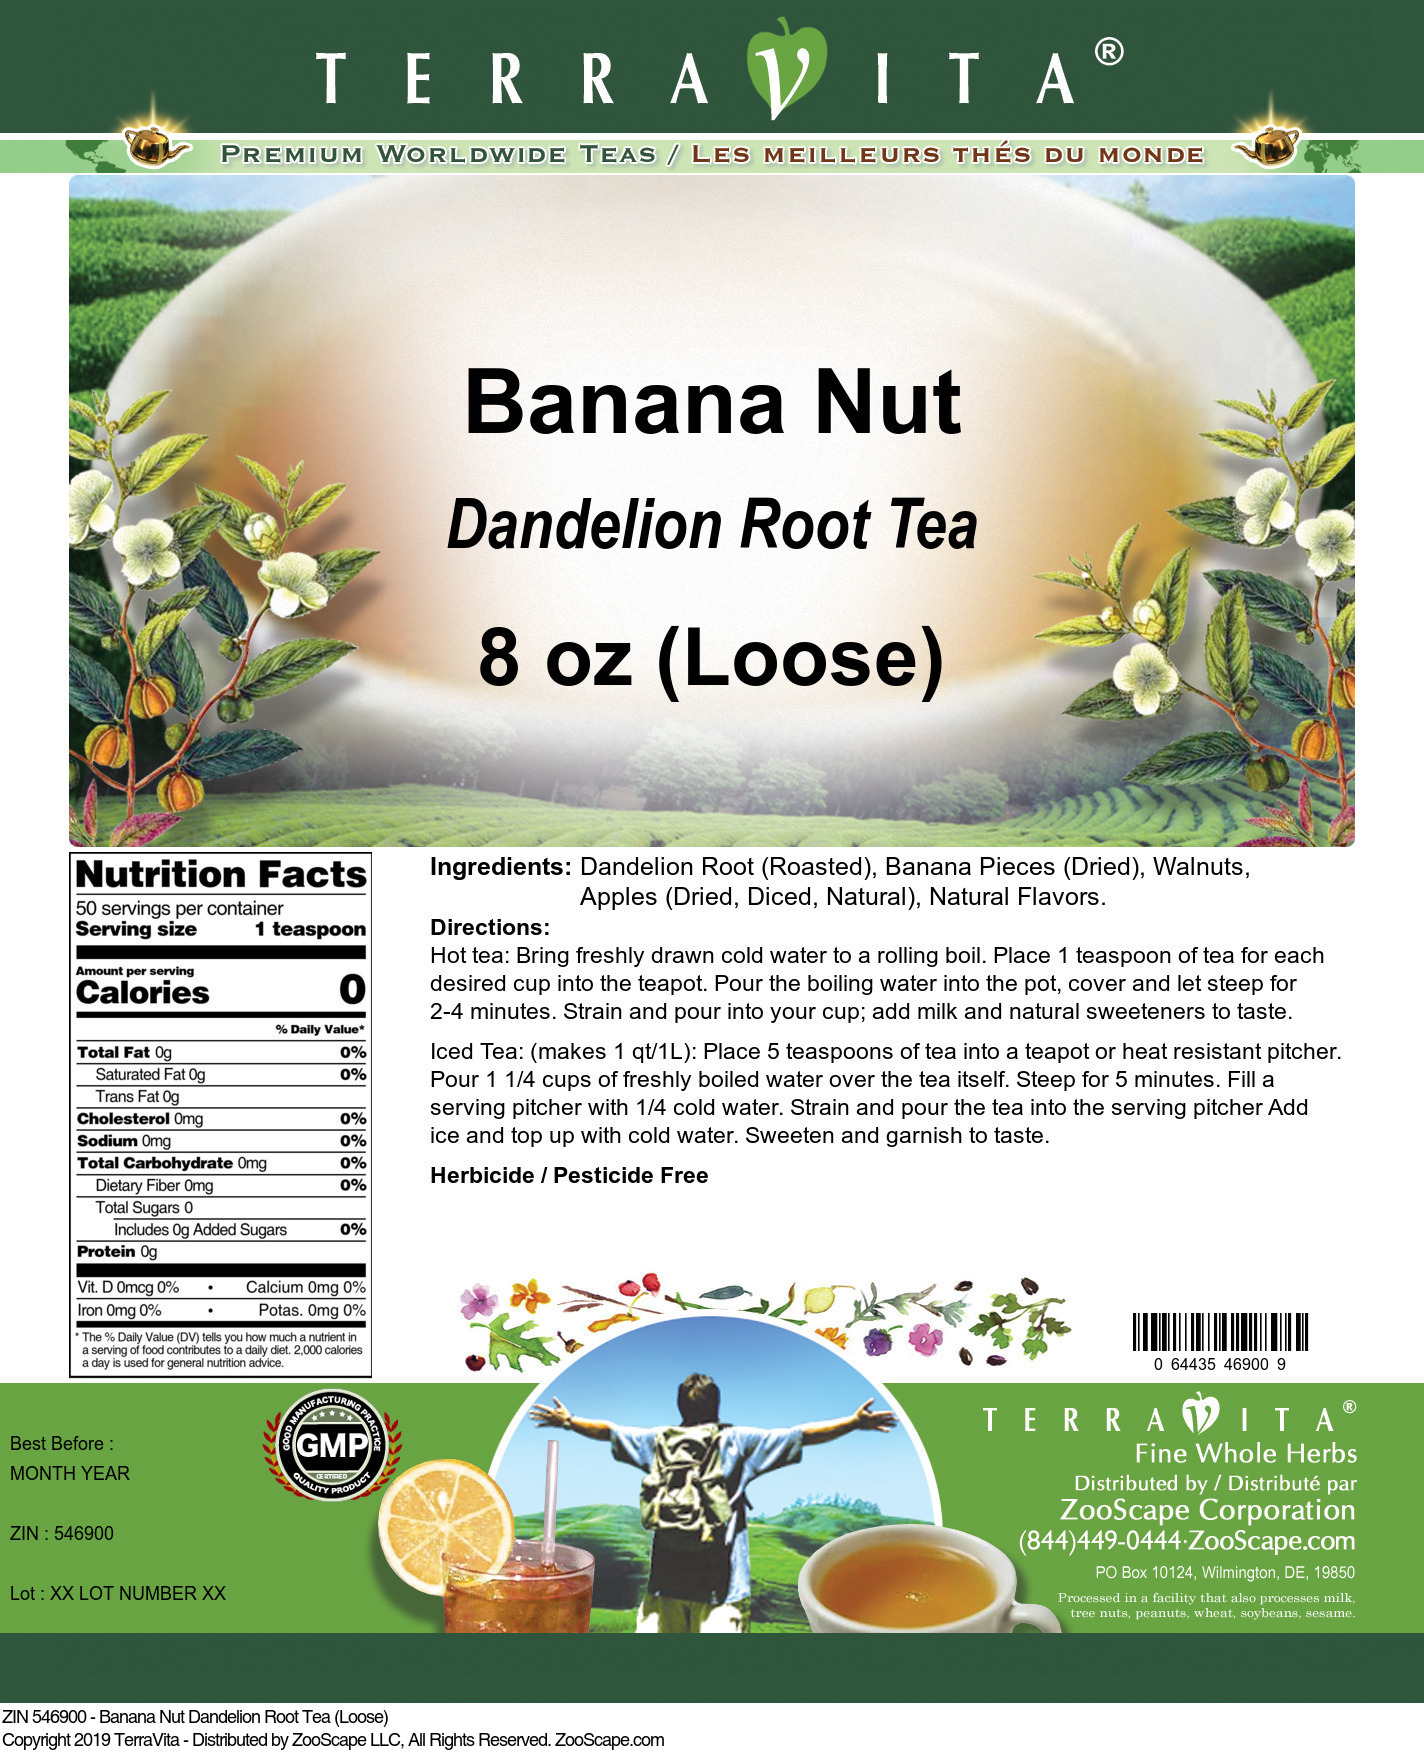 Banana Nut Dandelion Root Tea (Loose)